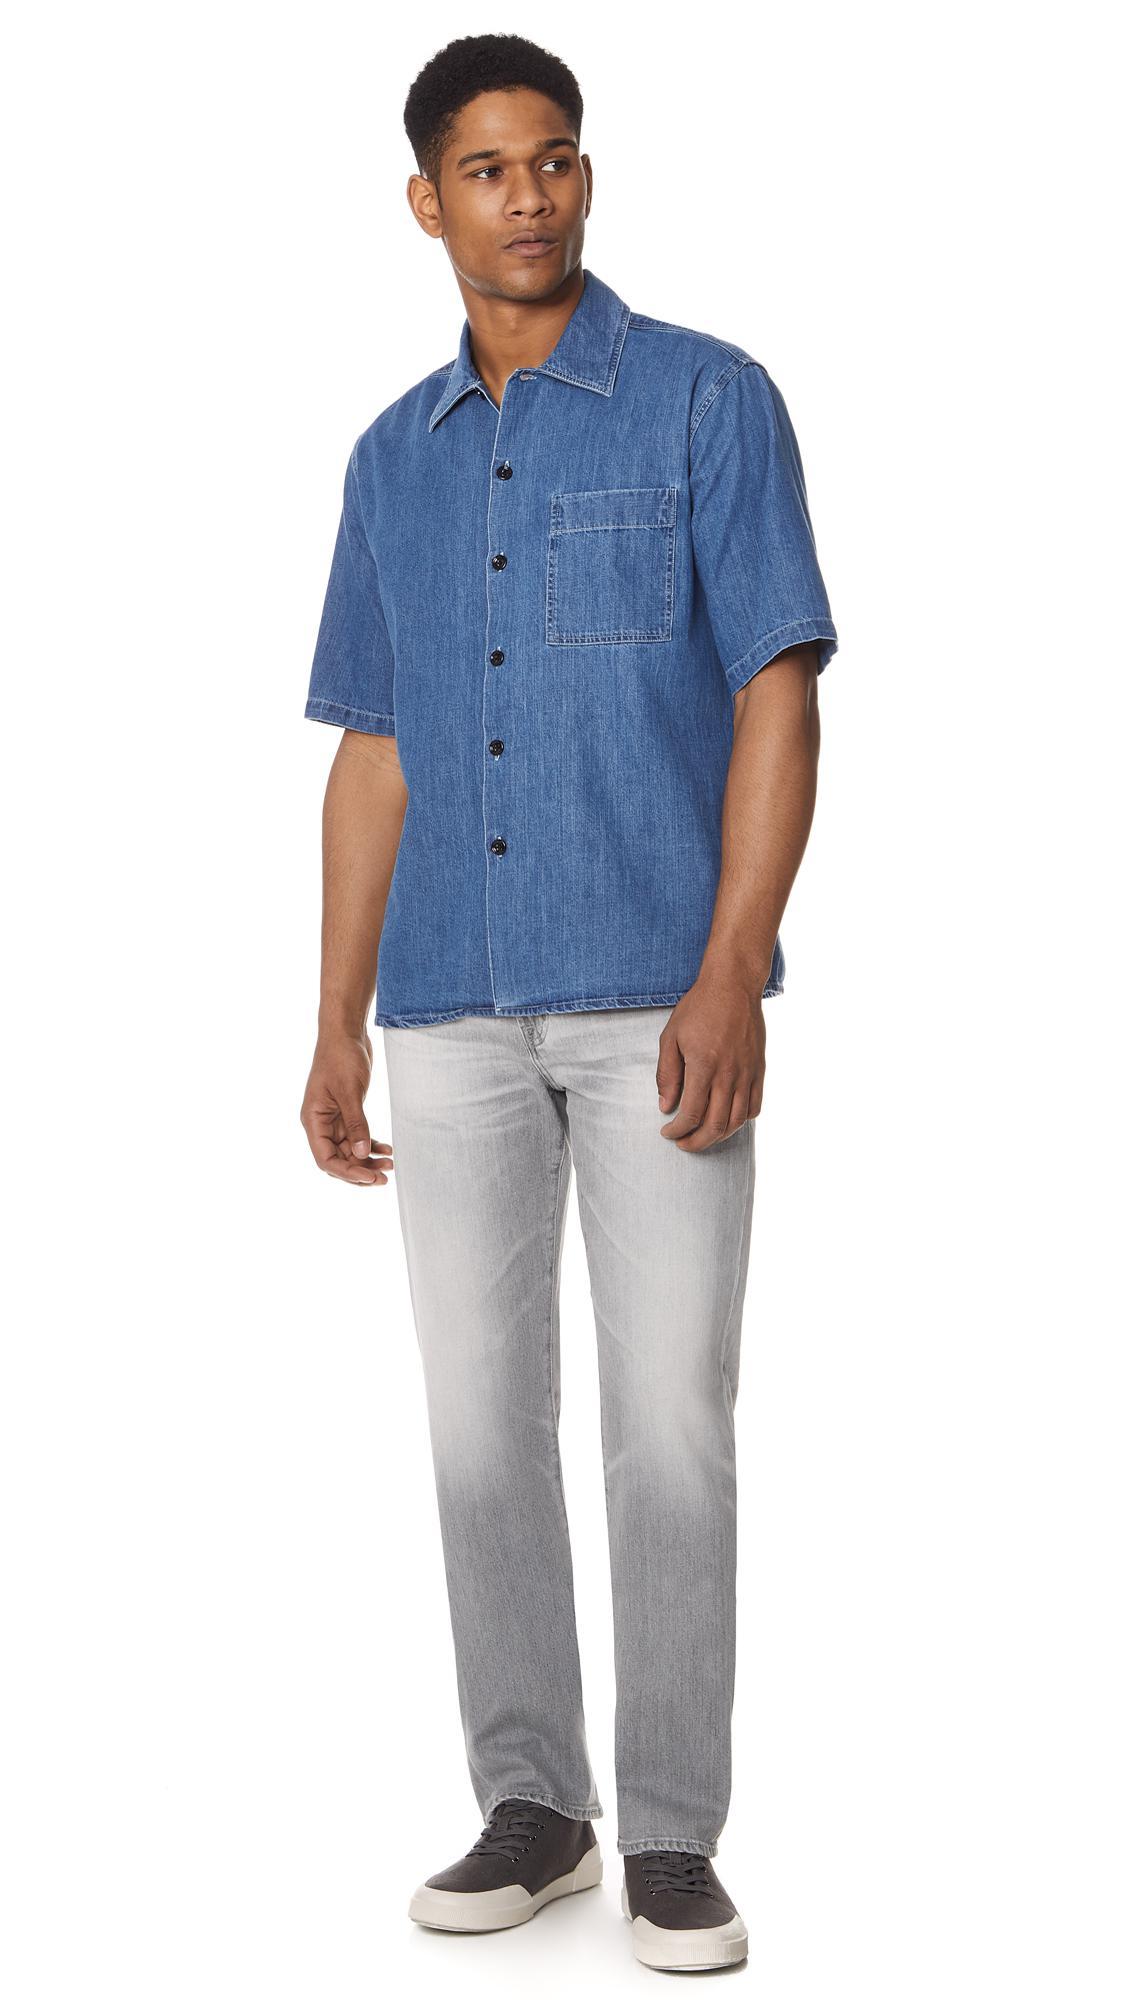 AG Jeans Graduate Tailored Leg Mso Grey Denim in Grey for Men